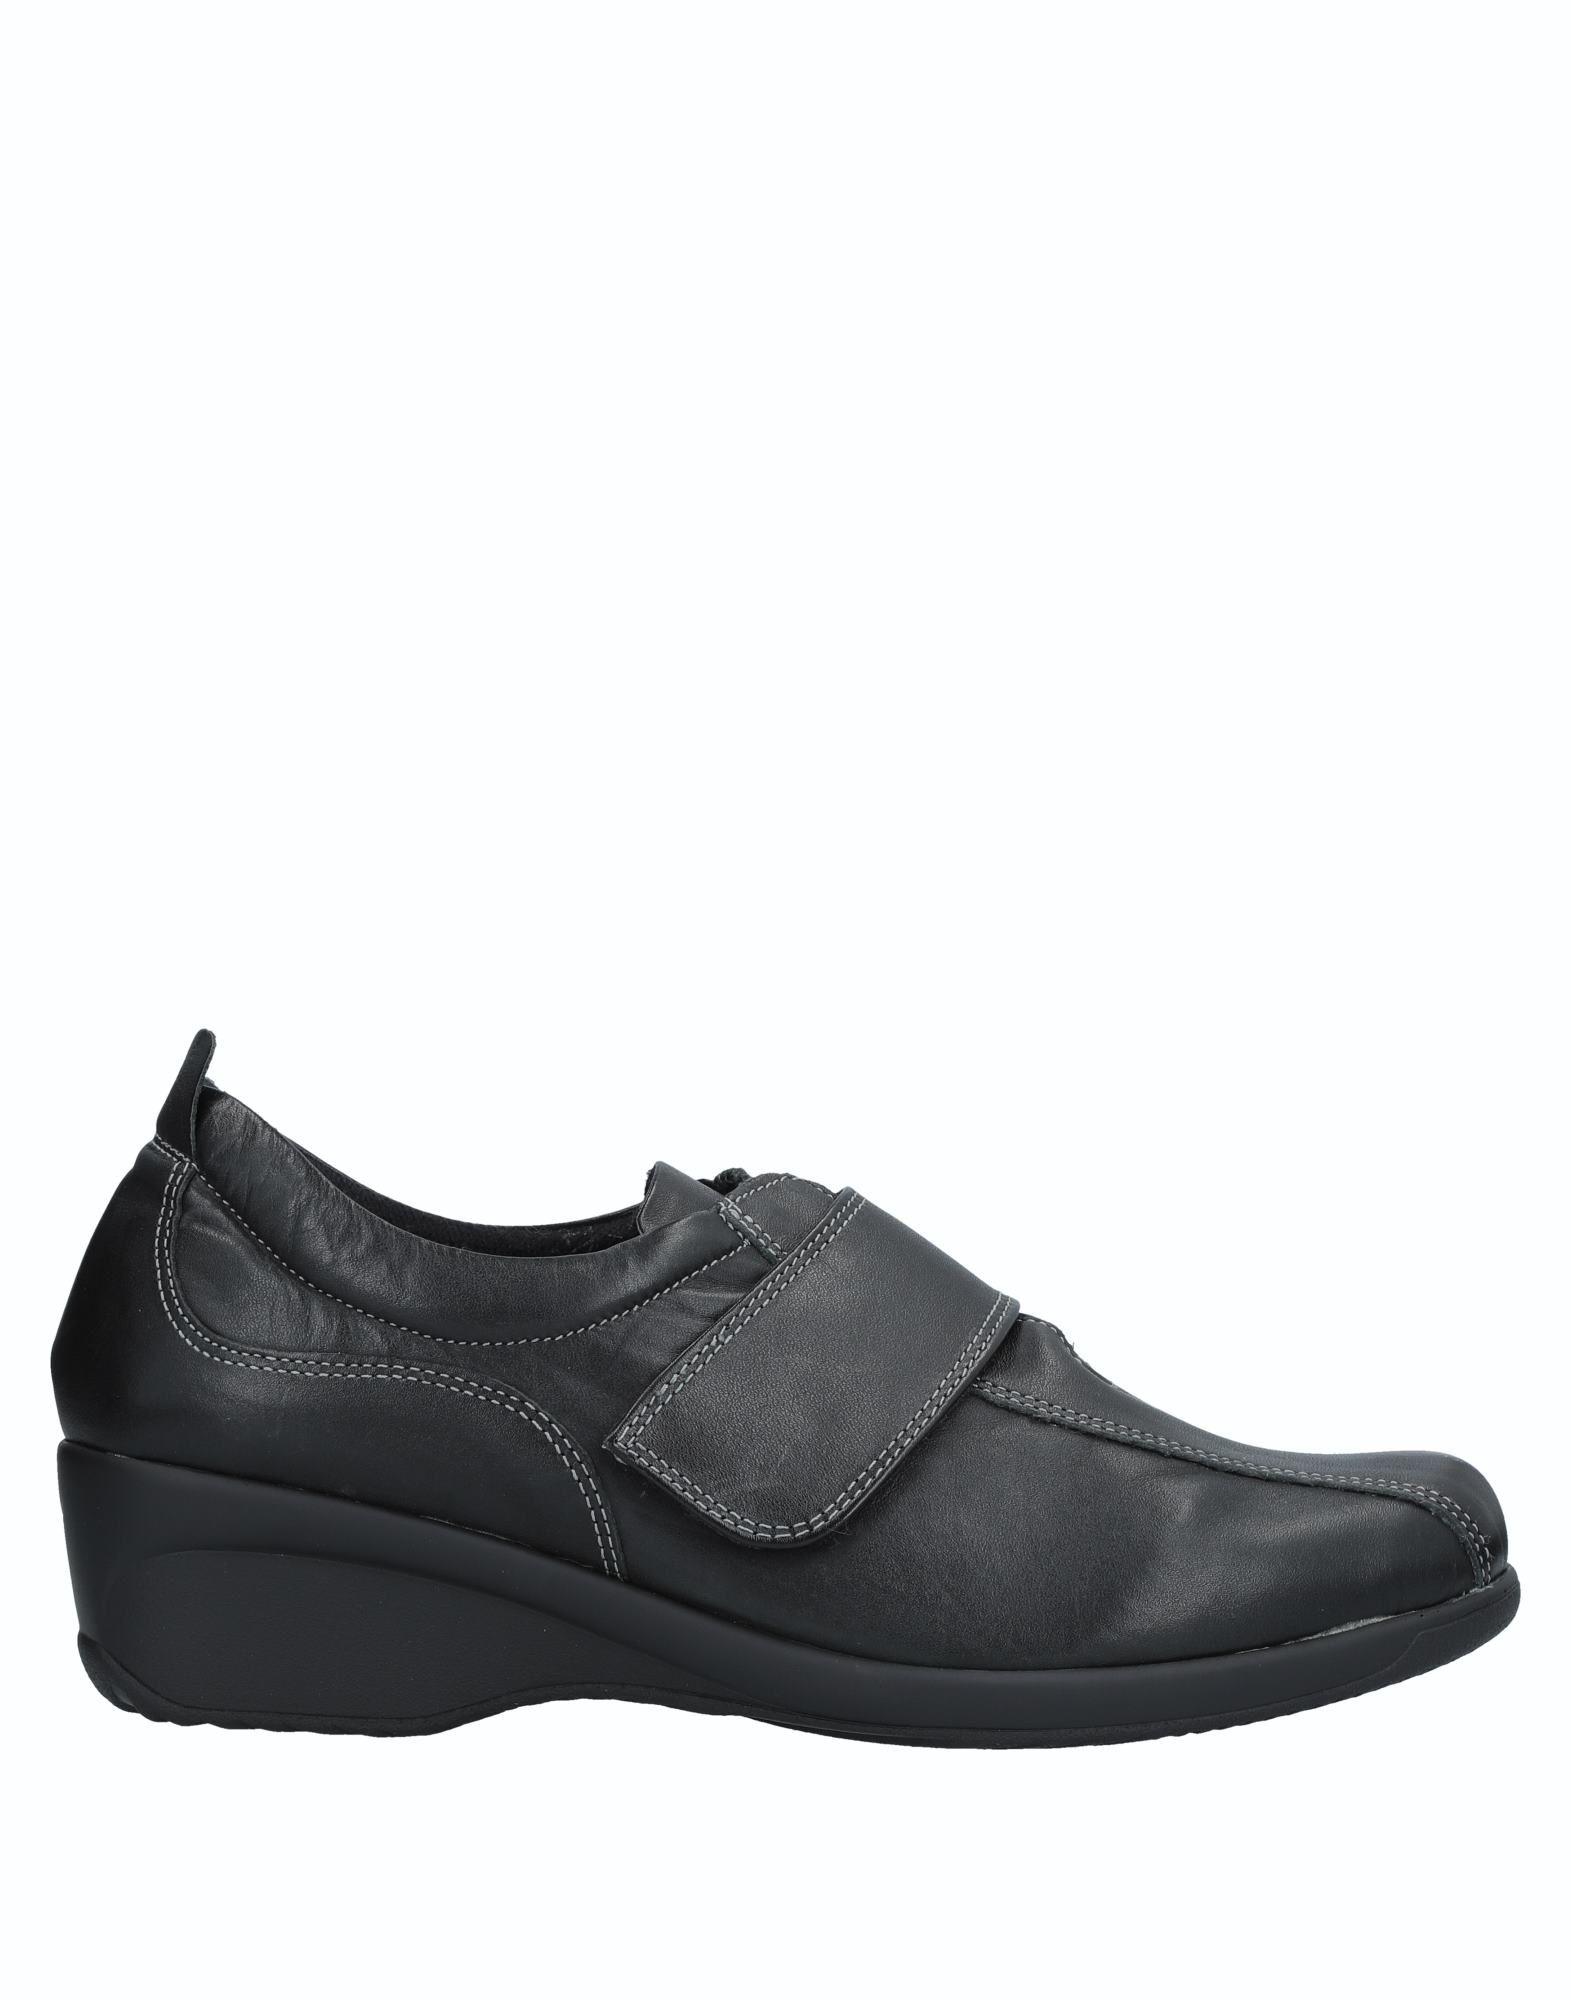 Sneakers Cinzia Soft By Mauri Moda Donna - 11537845OC